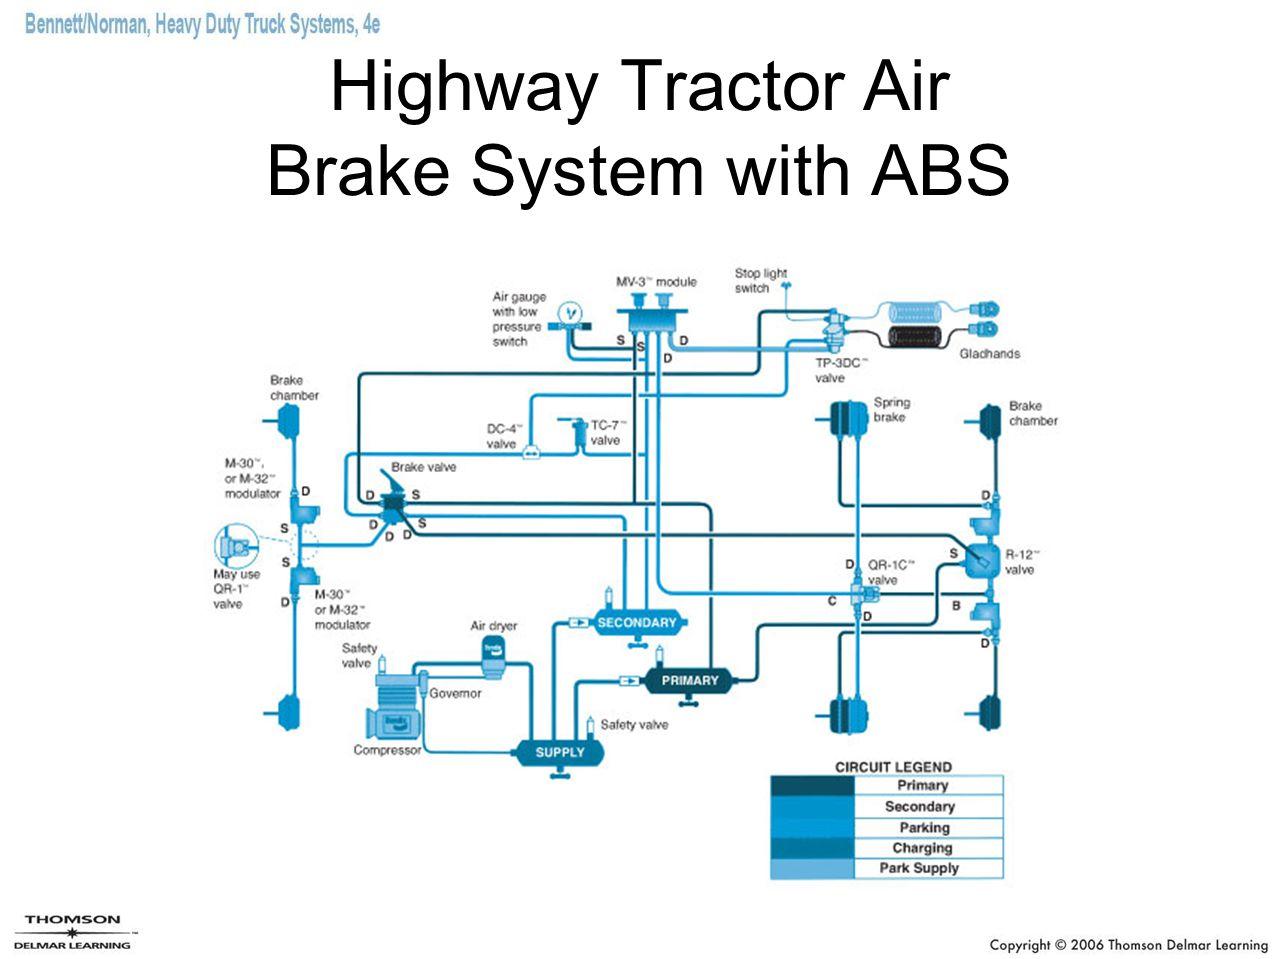 Haldex Abs System Schematic Explained Wiring Diagrams Trailer Air Brake Electrical Work Diagram U2022 Valve